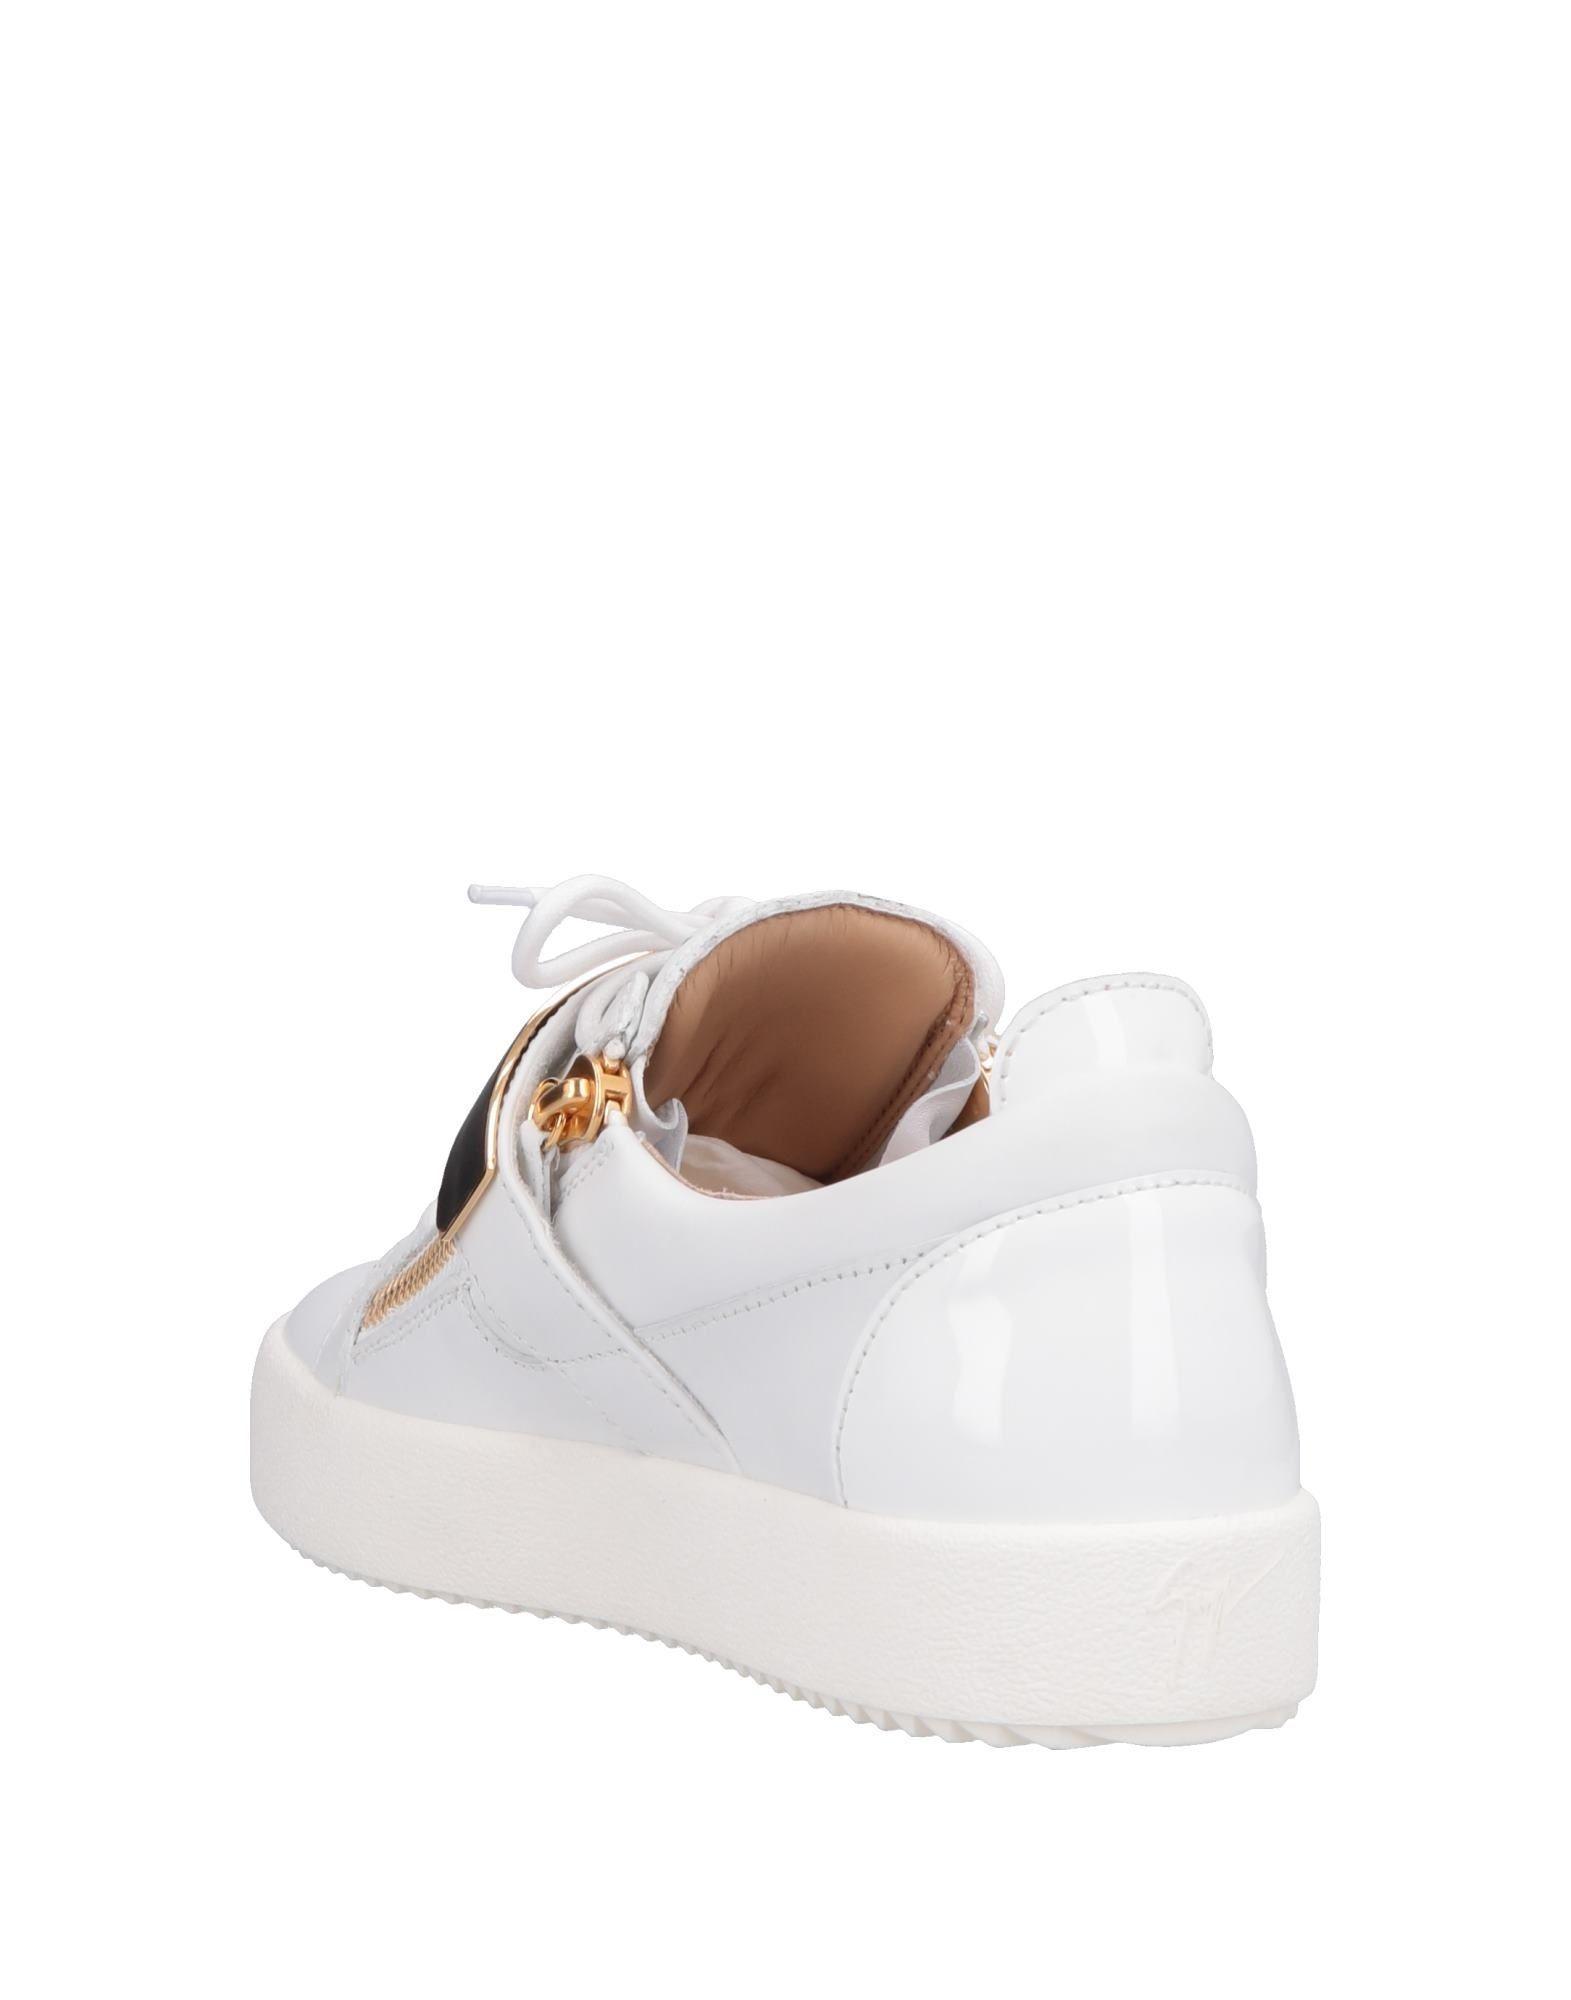 Sneakers & Tennis basses Cuir Giuseppe Zanotti pour homme en coloris Blanc 3INi